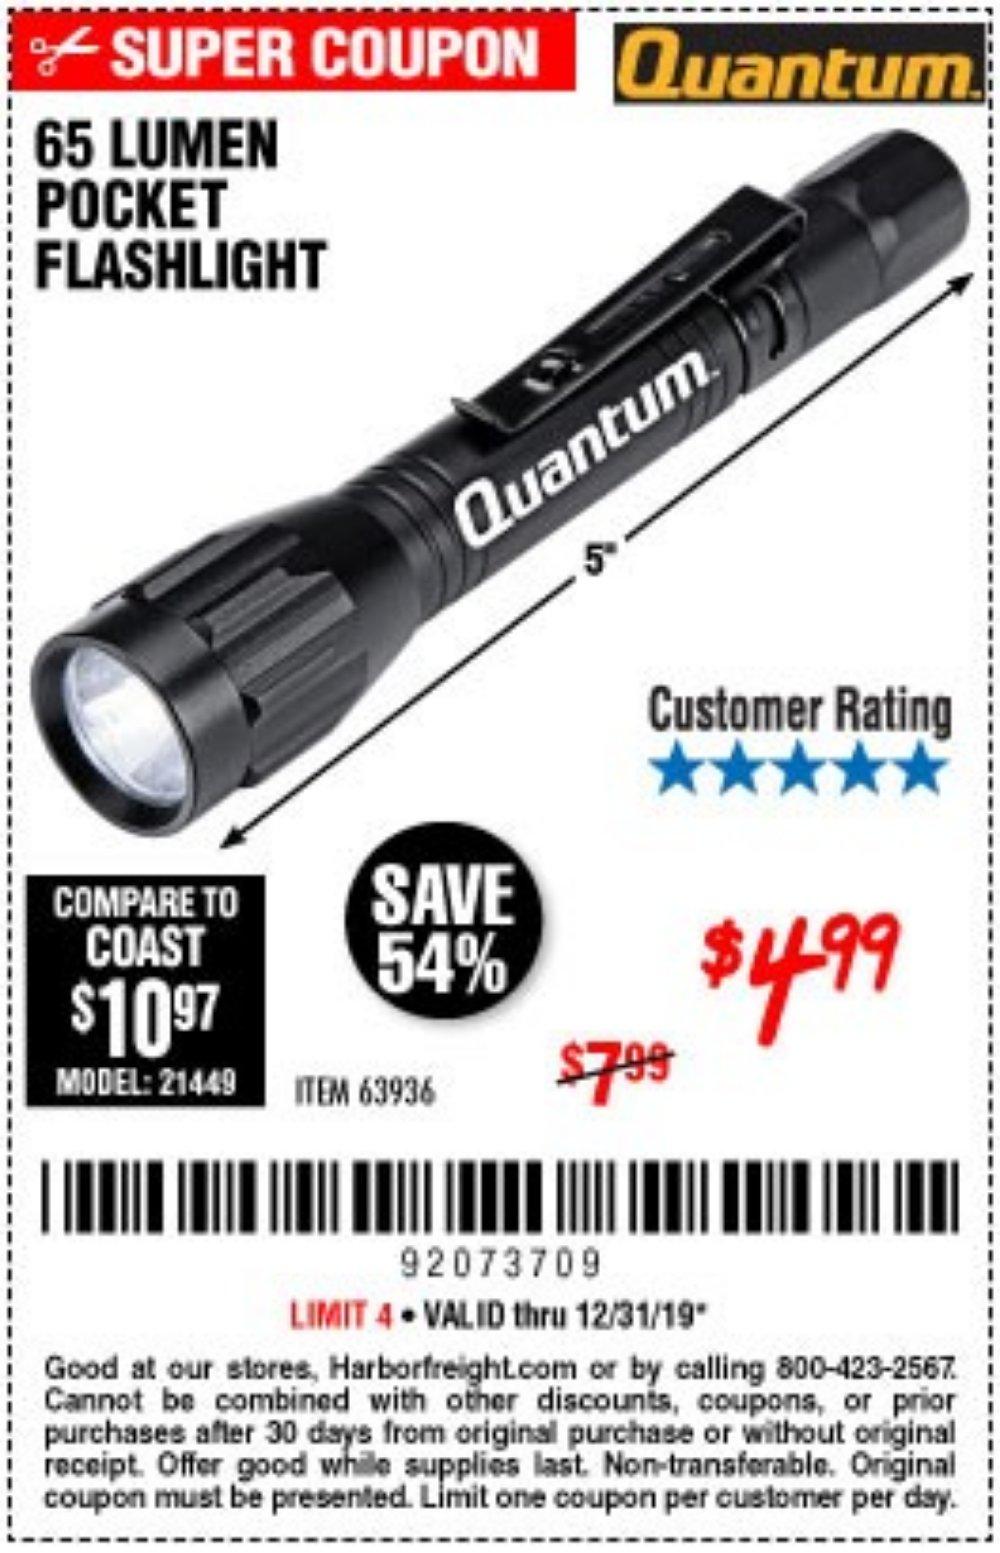 Harbor Freight Coupon, HF Coupons - 65 Lumens Pocket Flashlight